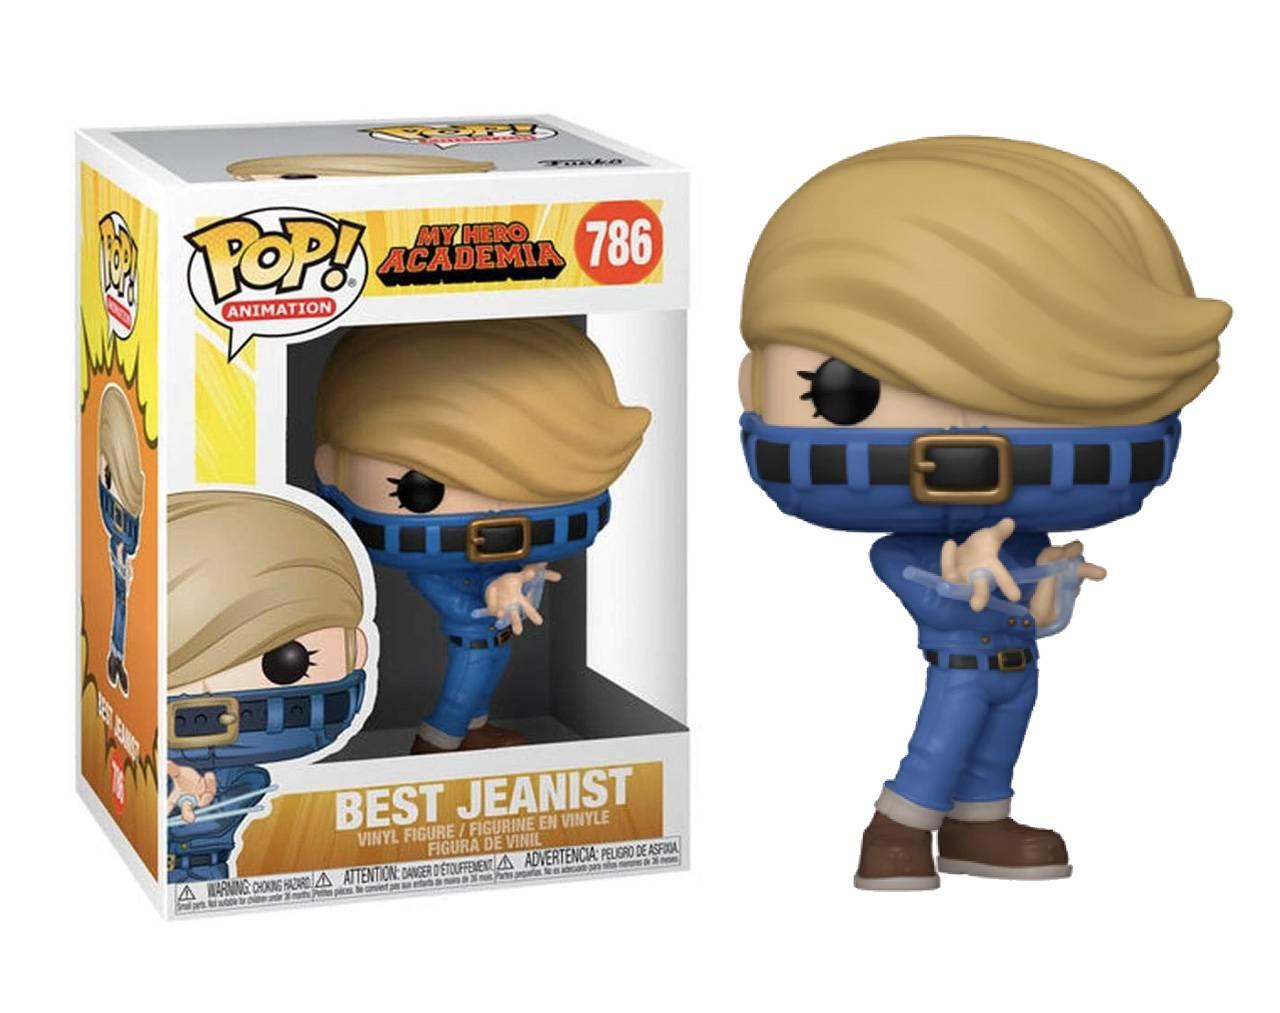 Best Jeanist Pop! Vinyl